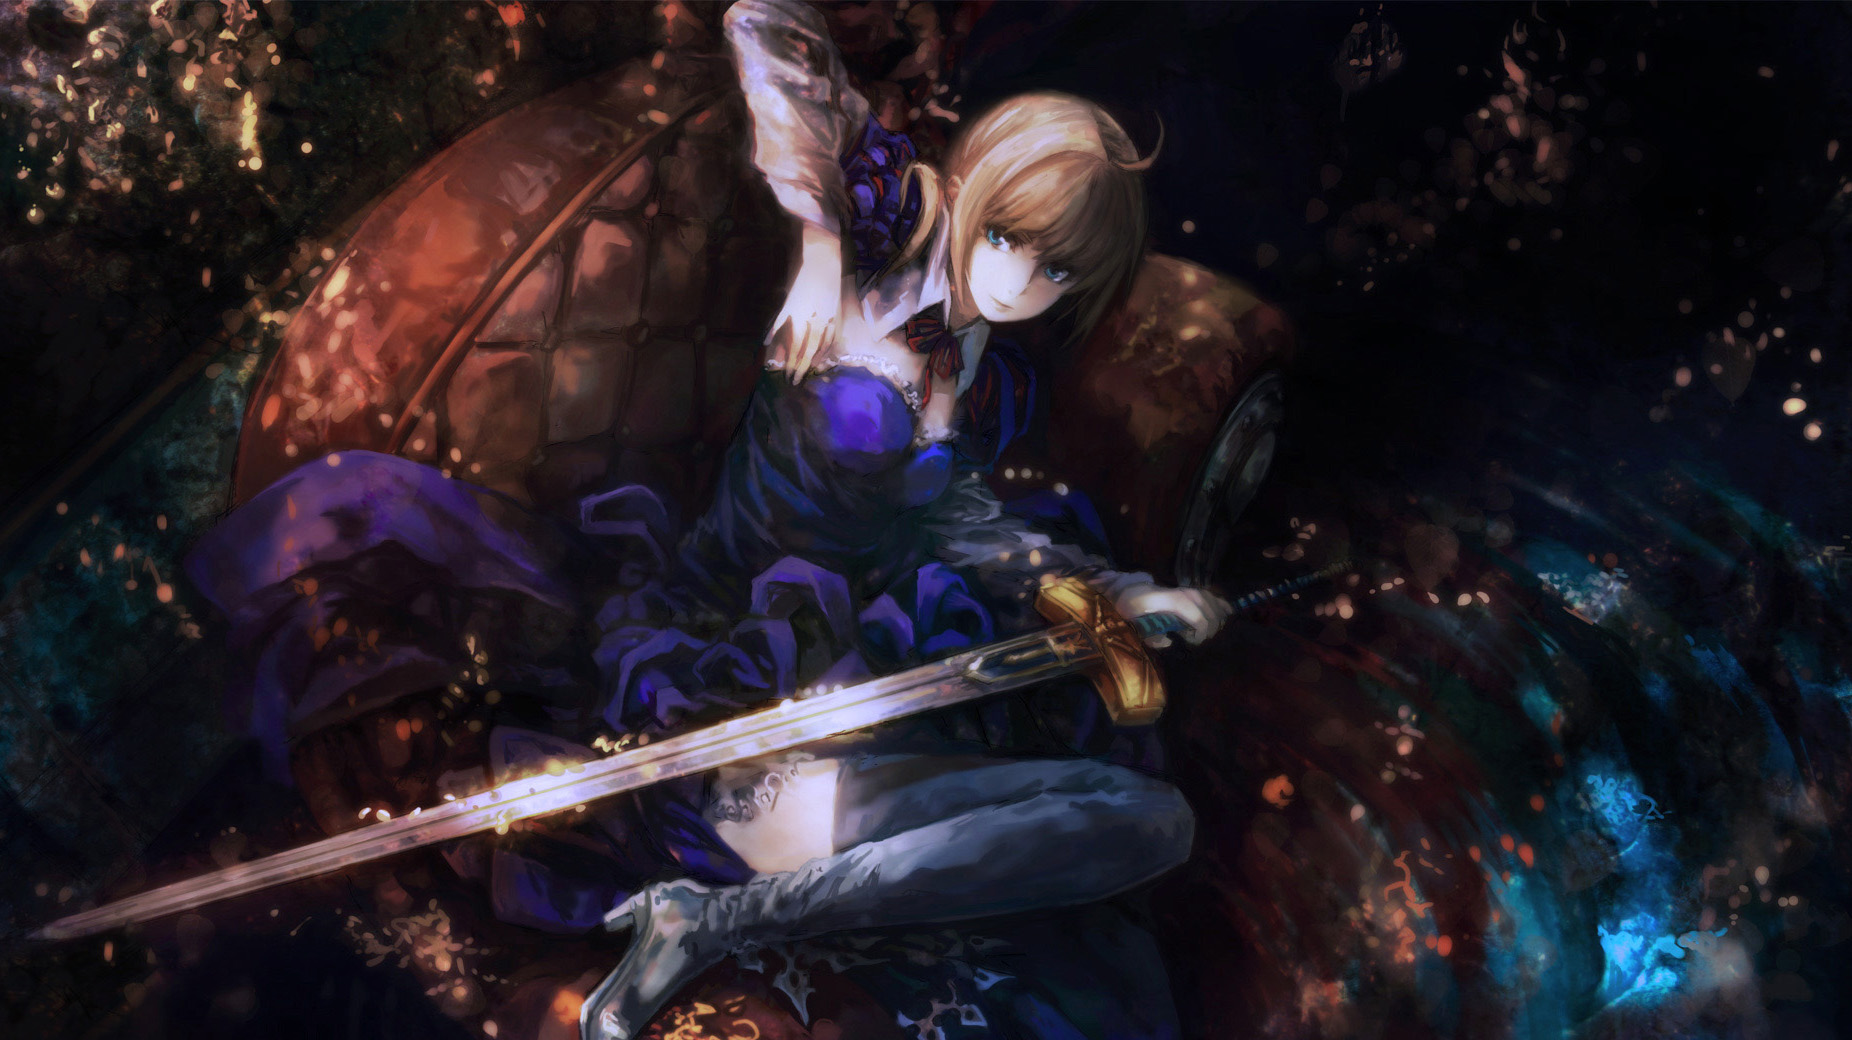 Fate Zero Hd Wallpaper Posted By John Johnson